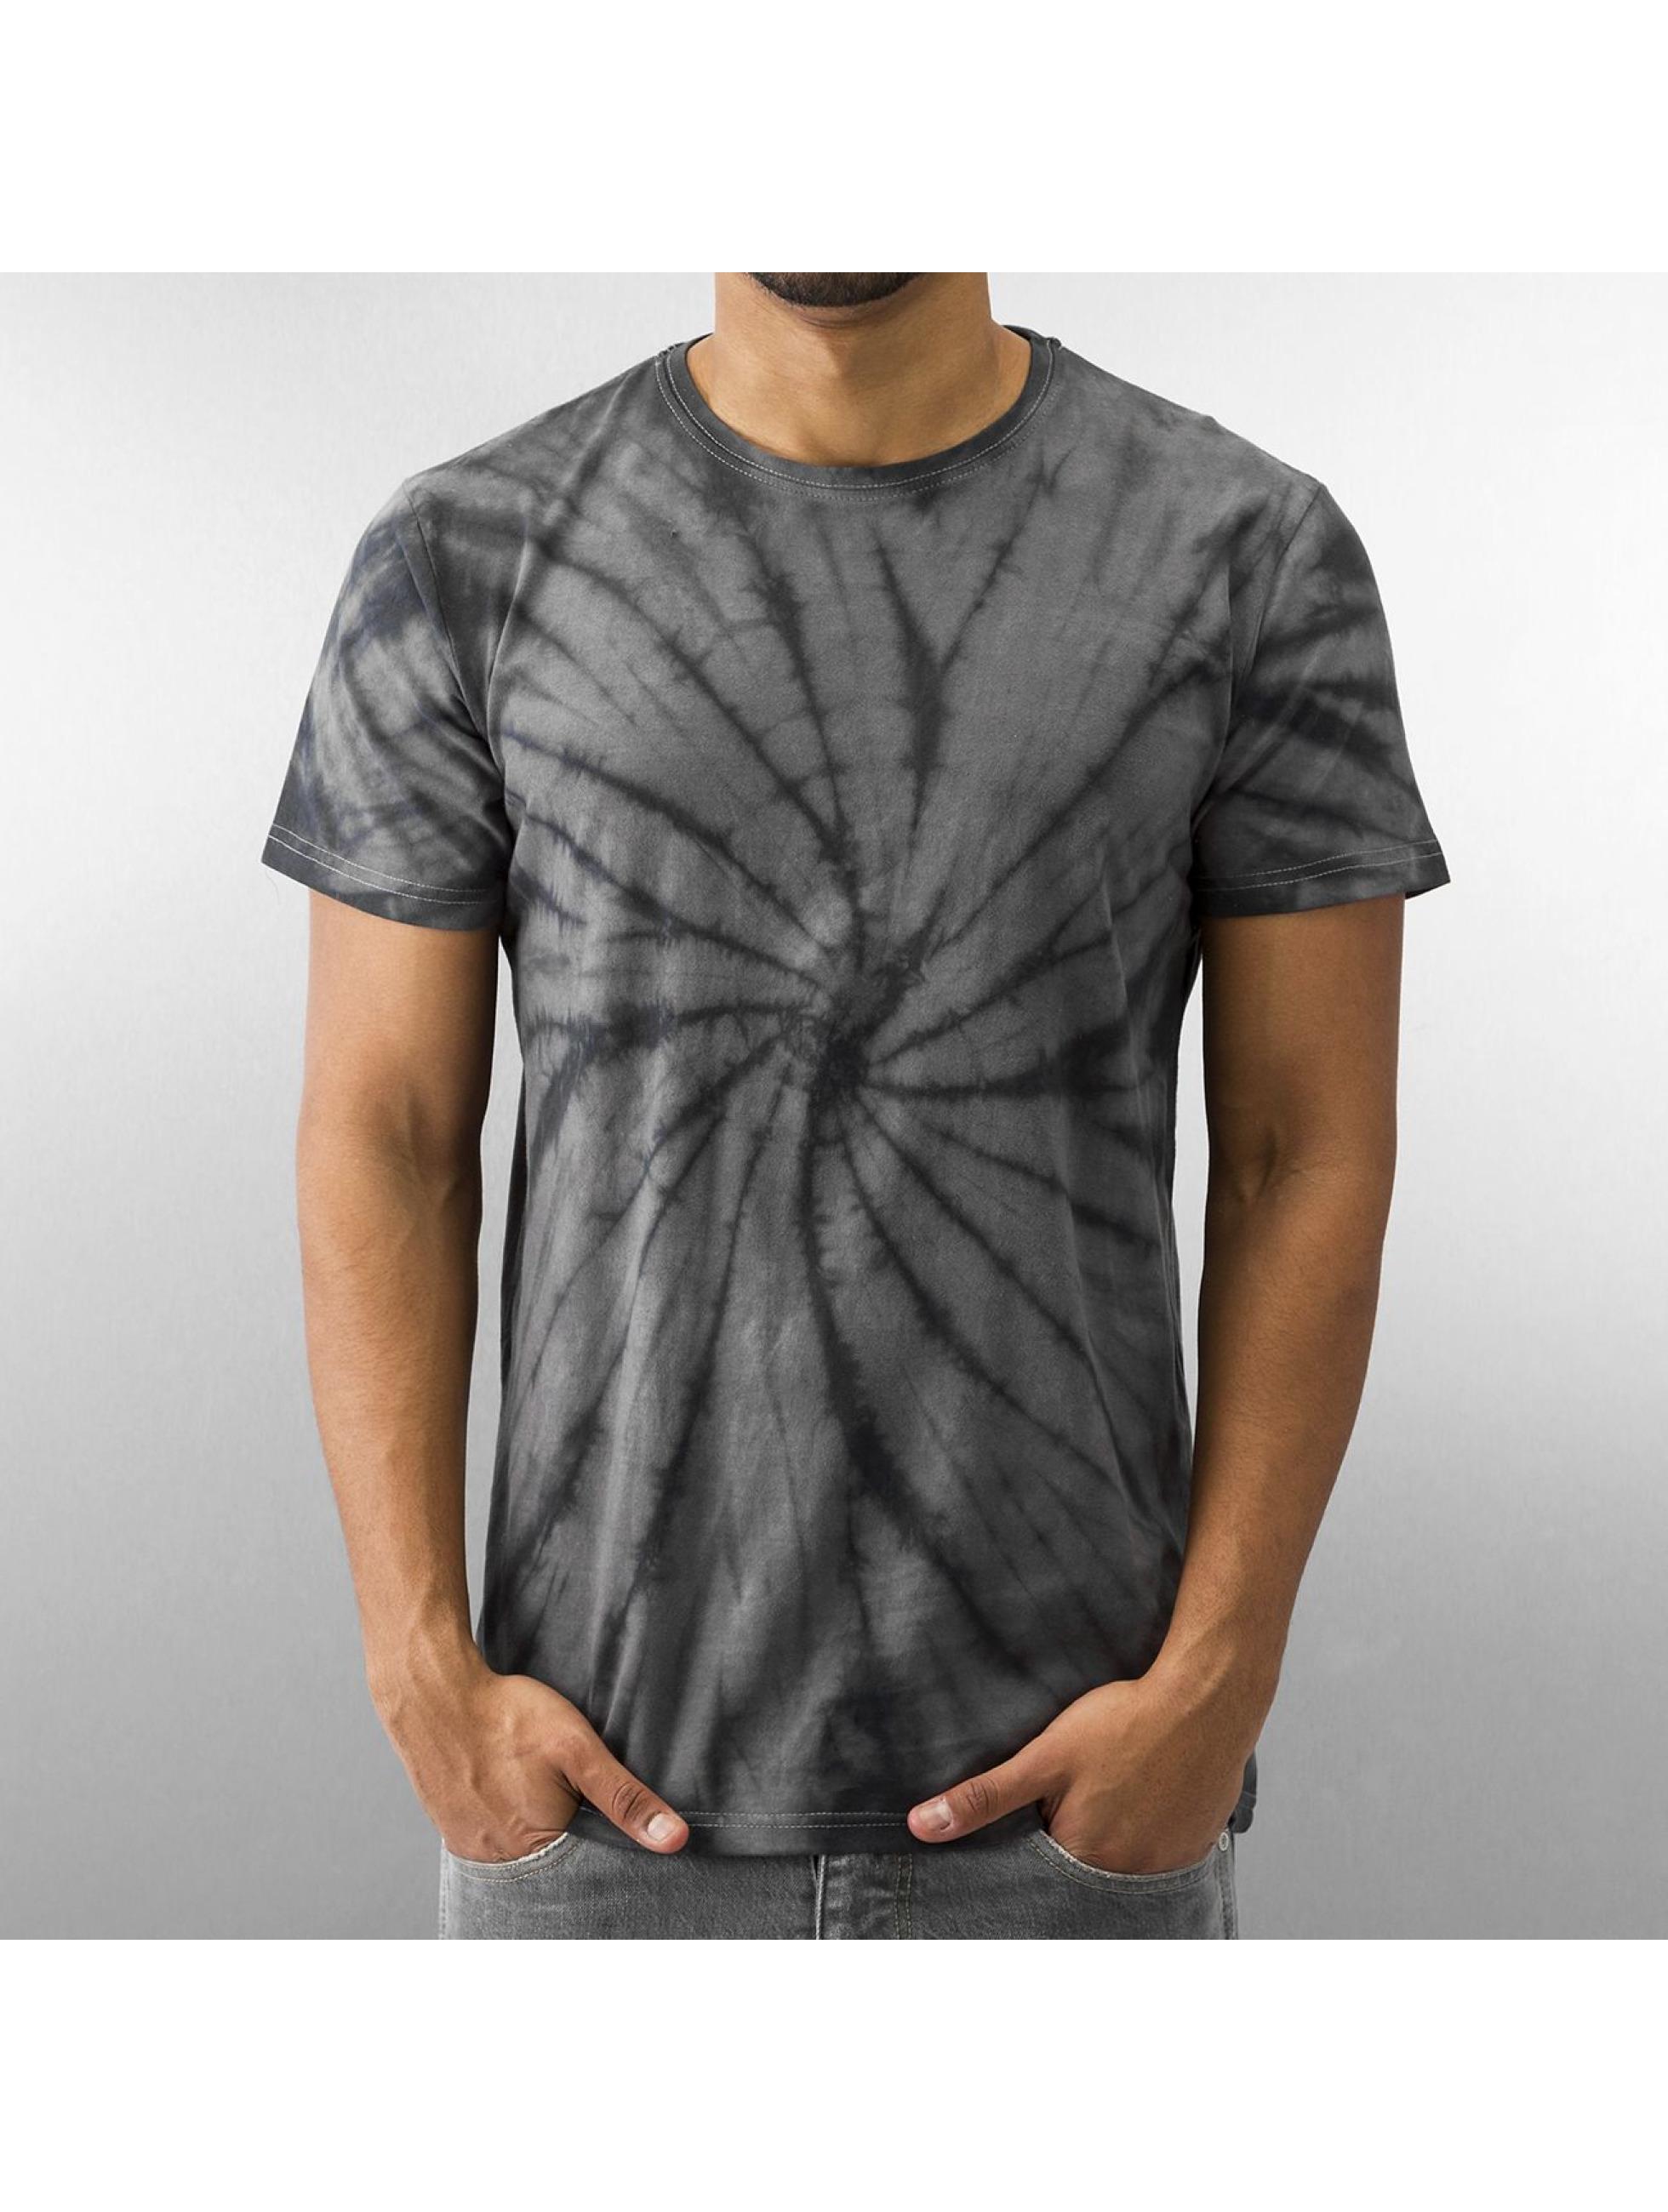 Urban Classics Batik T Shirt Dark Grey Black